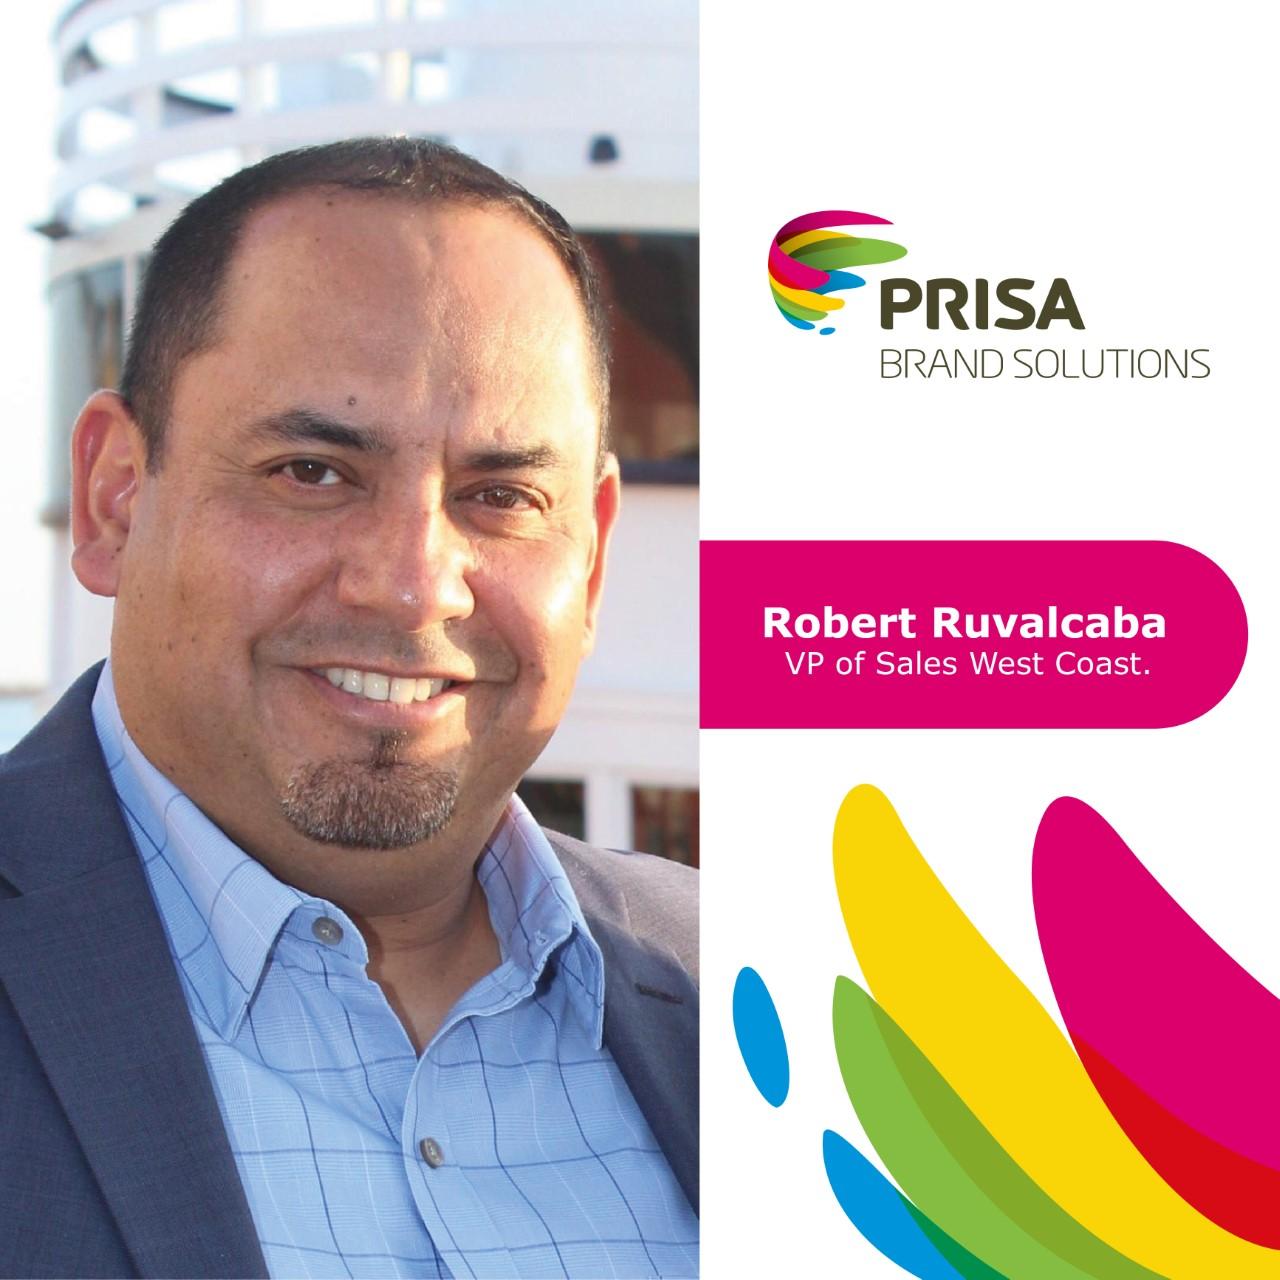 Robert Rubalcava